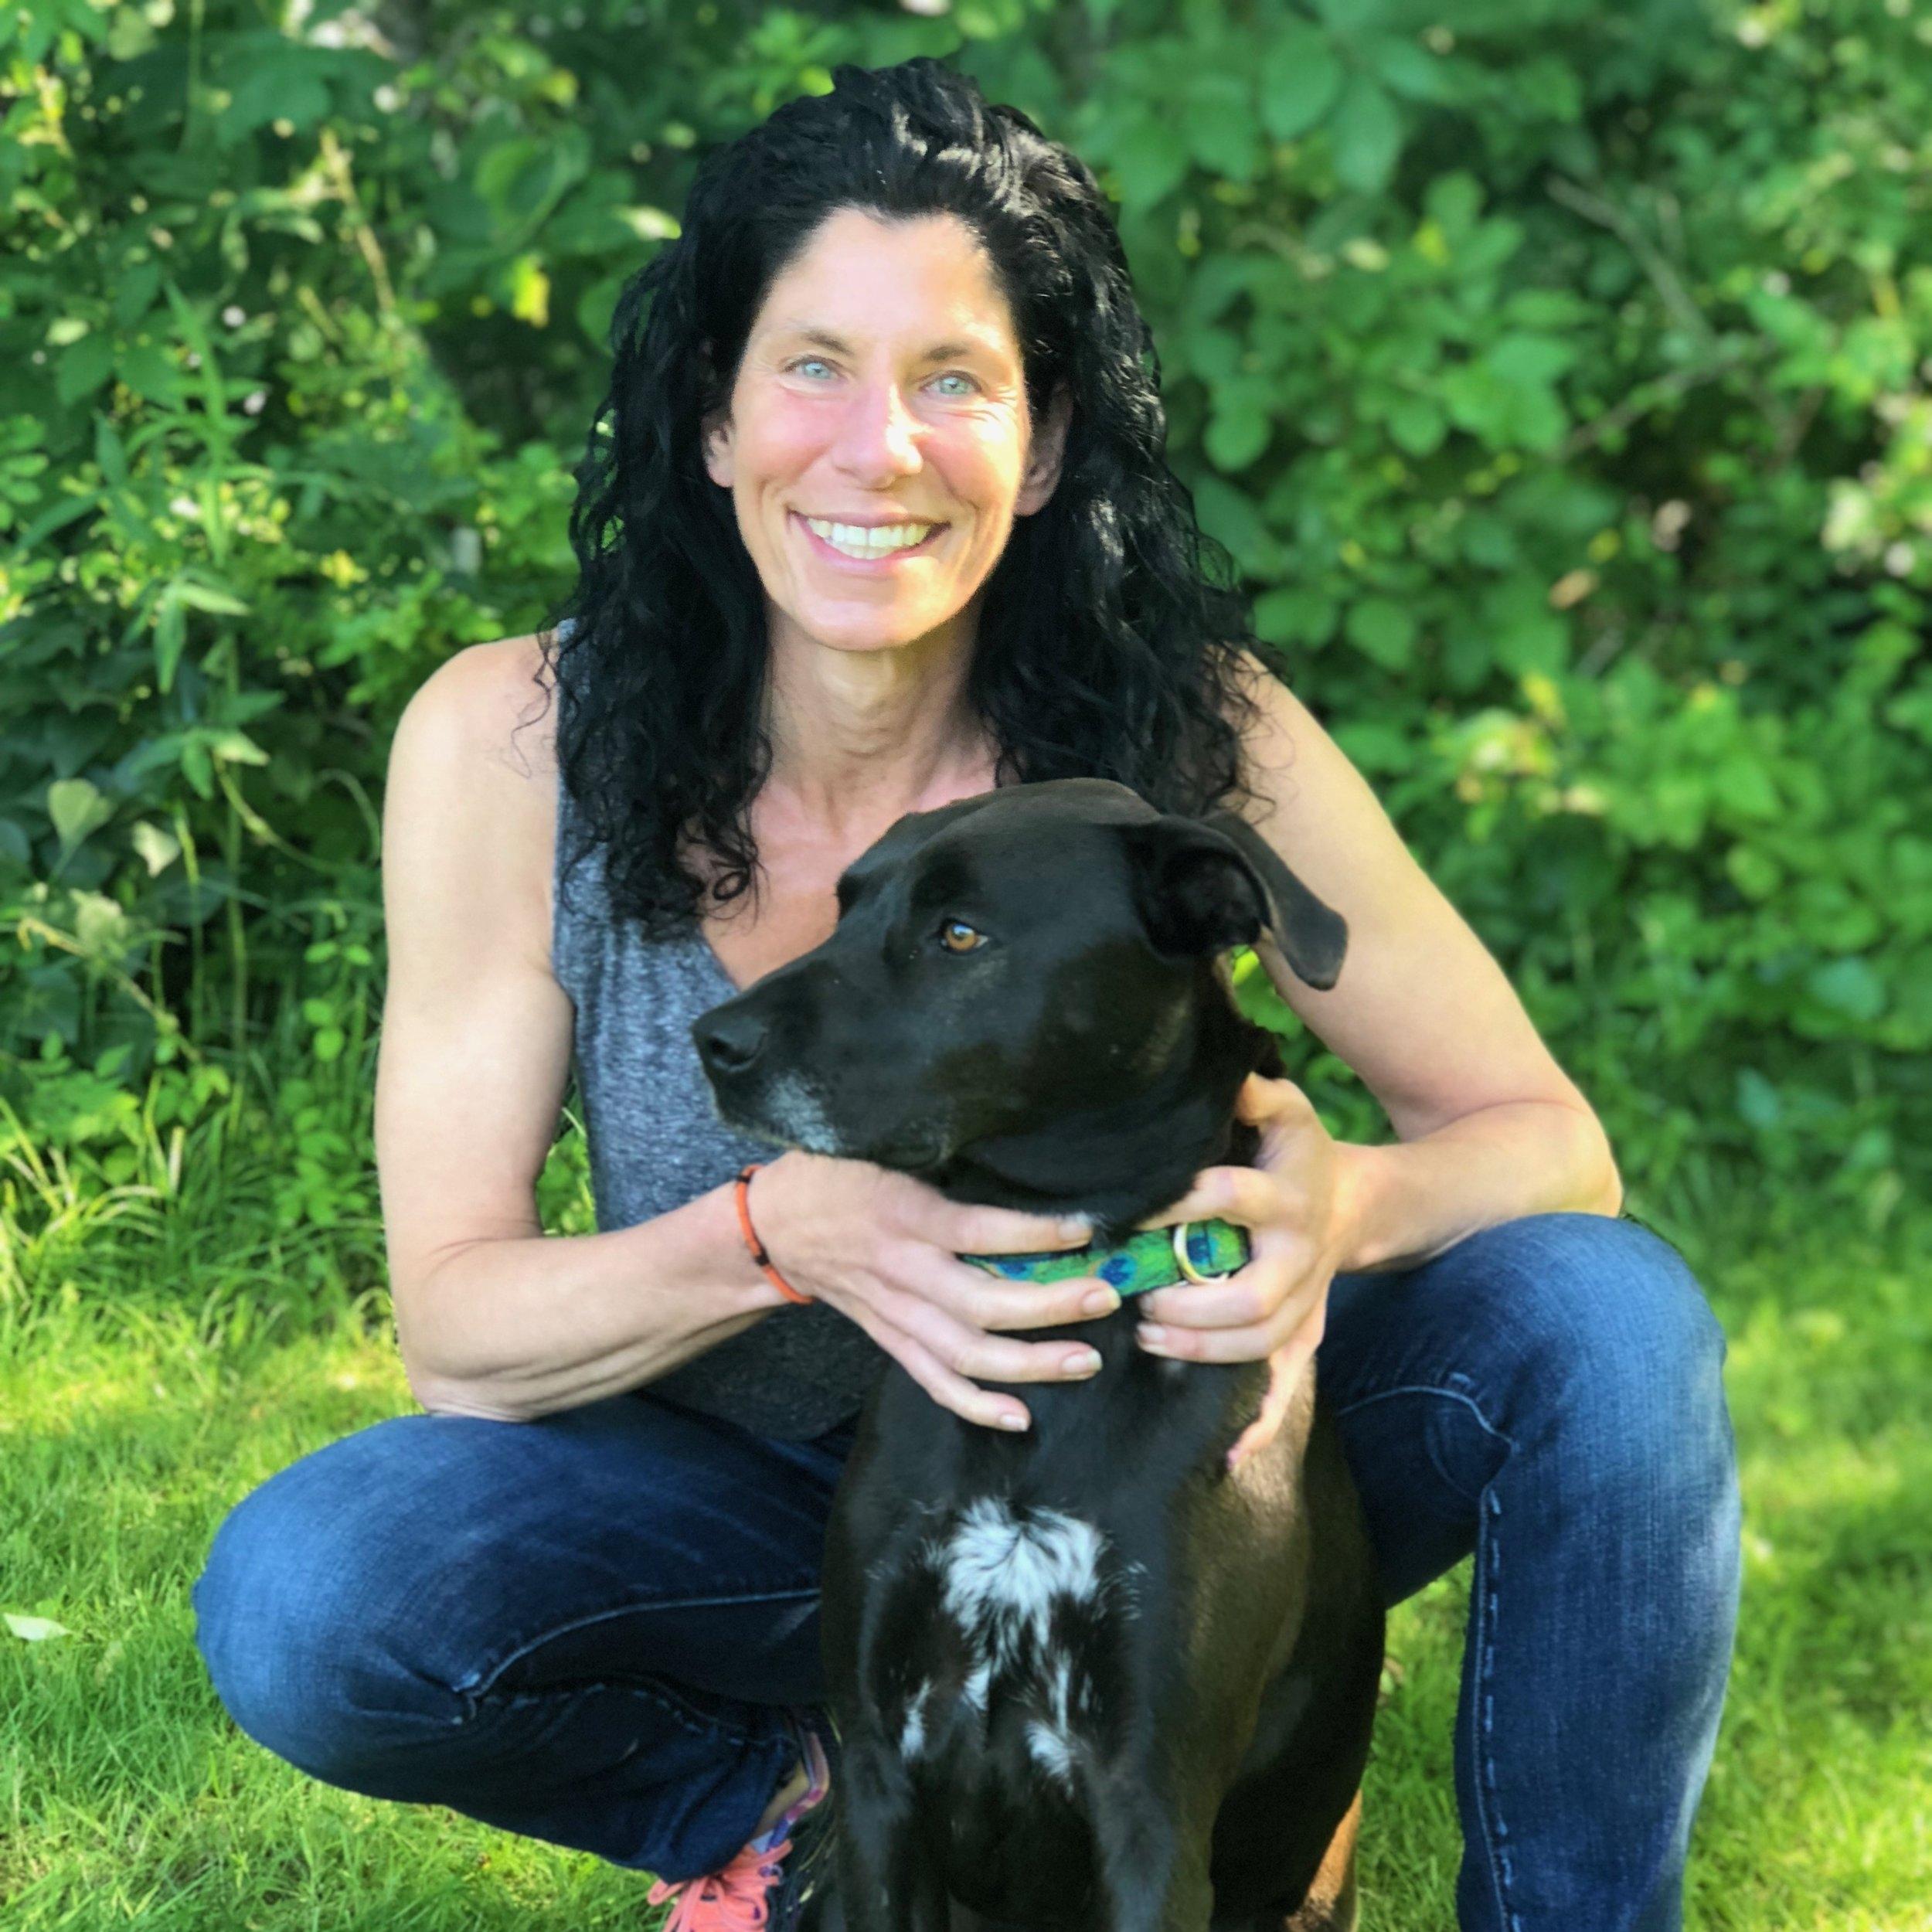 Sharon tedesco of south bay veterinary clinic